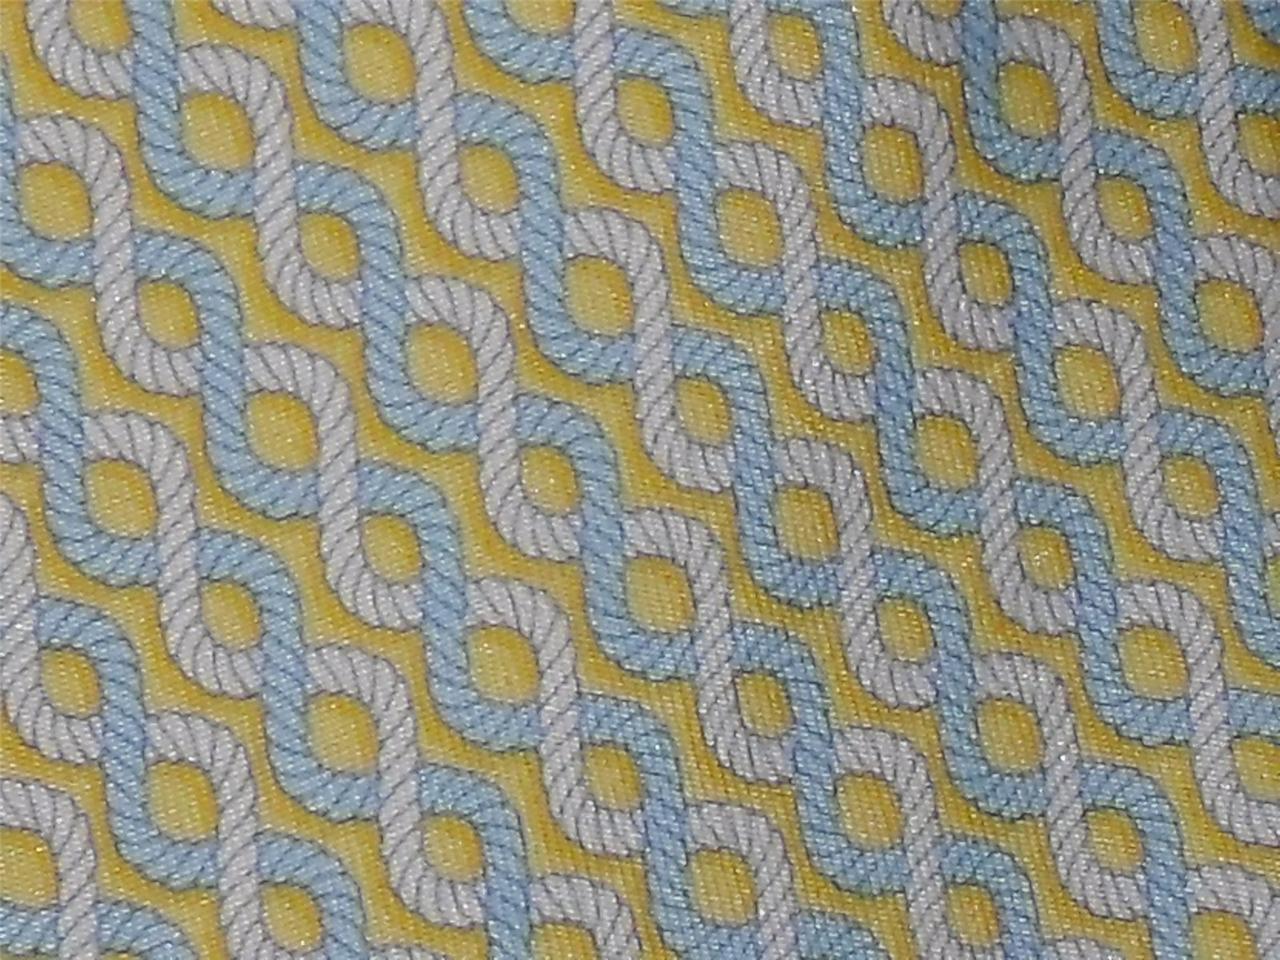 Vineyard-Vines-Rope-Twist-Nautical-Pattern-SILK-Neck-Tie-NWT-75-Many    Vineyard Vines Fish Pattern